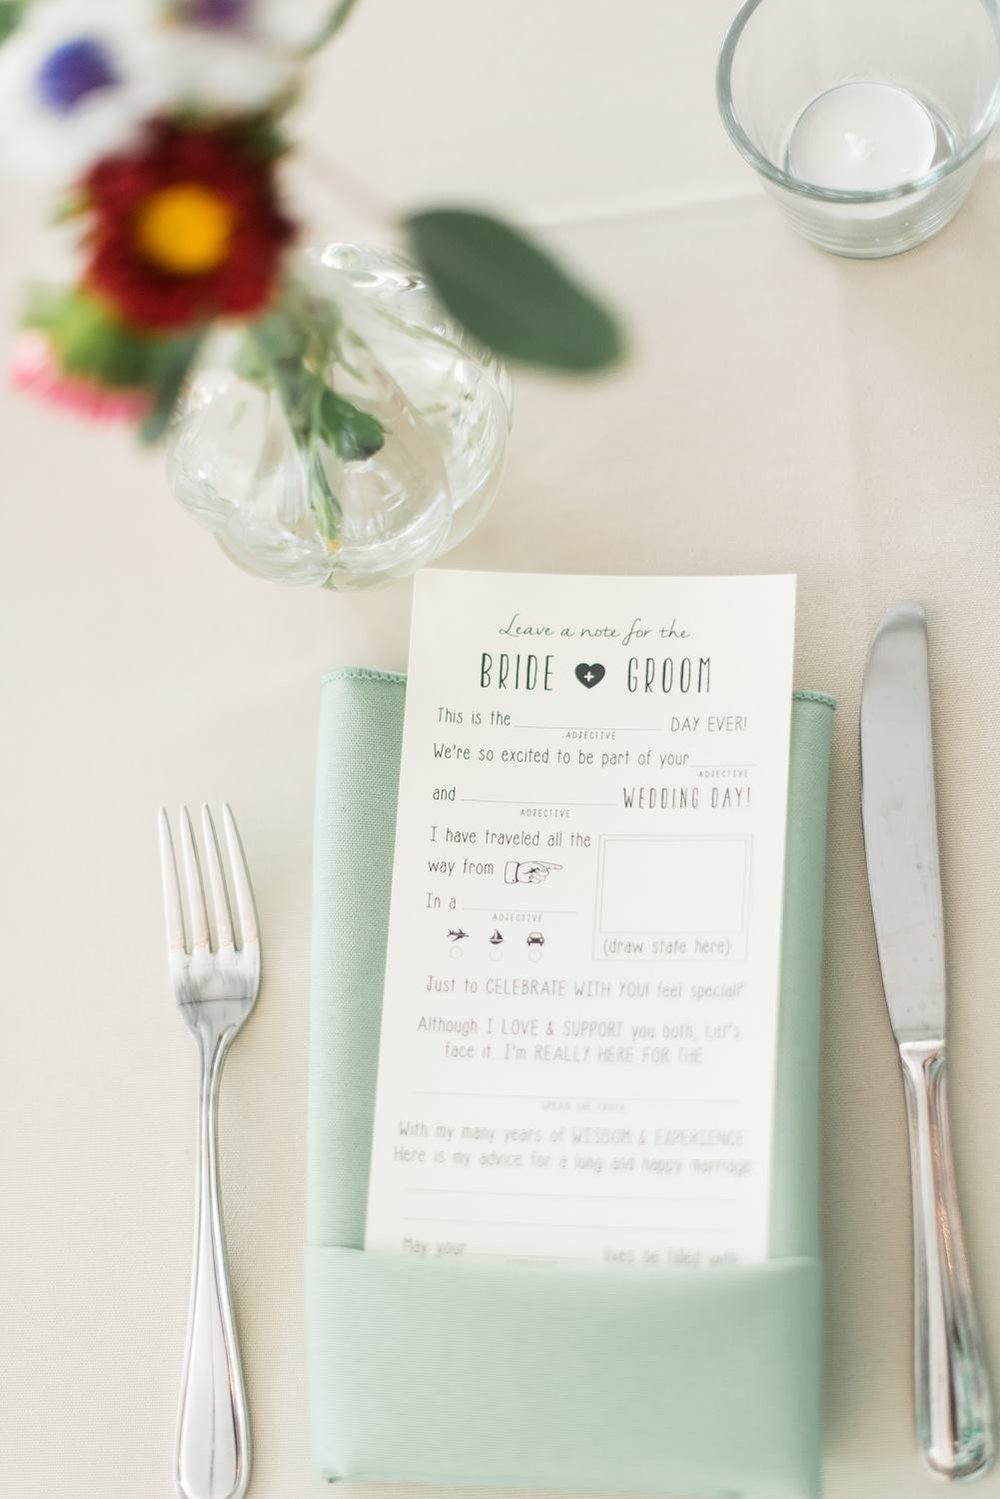 pittsburgh-botanic-garden-wedding-rustic-romantic-pennsylvania-0030.jpg